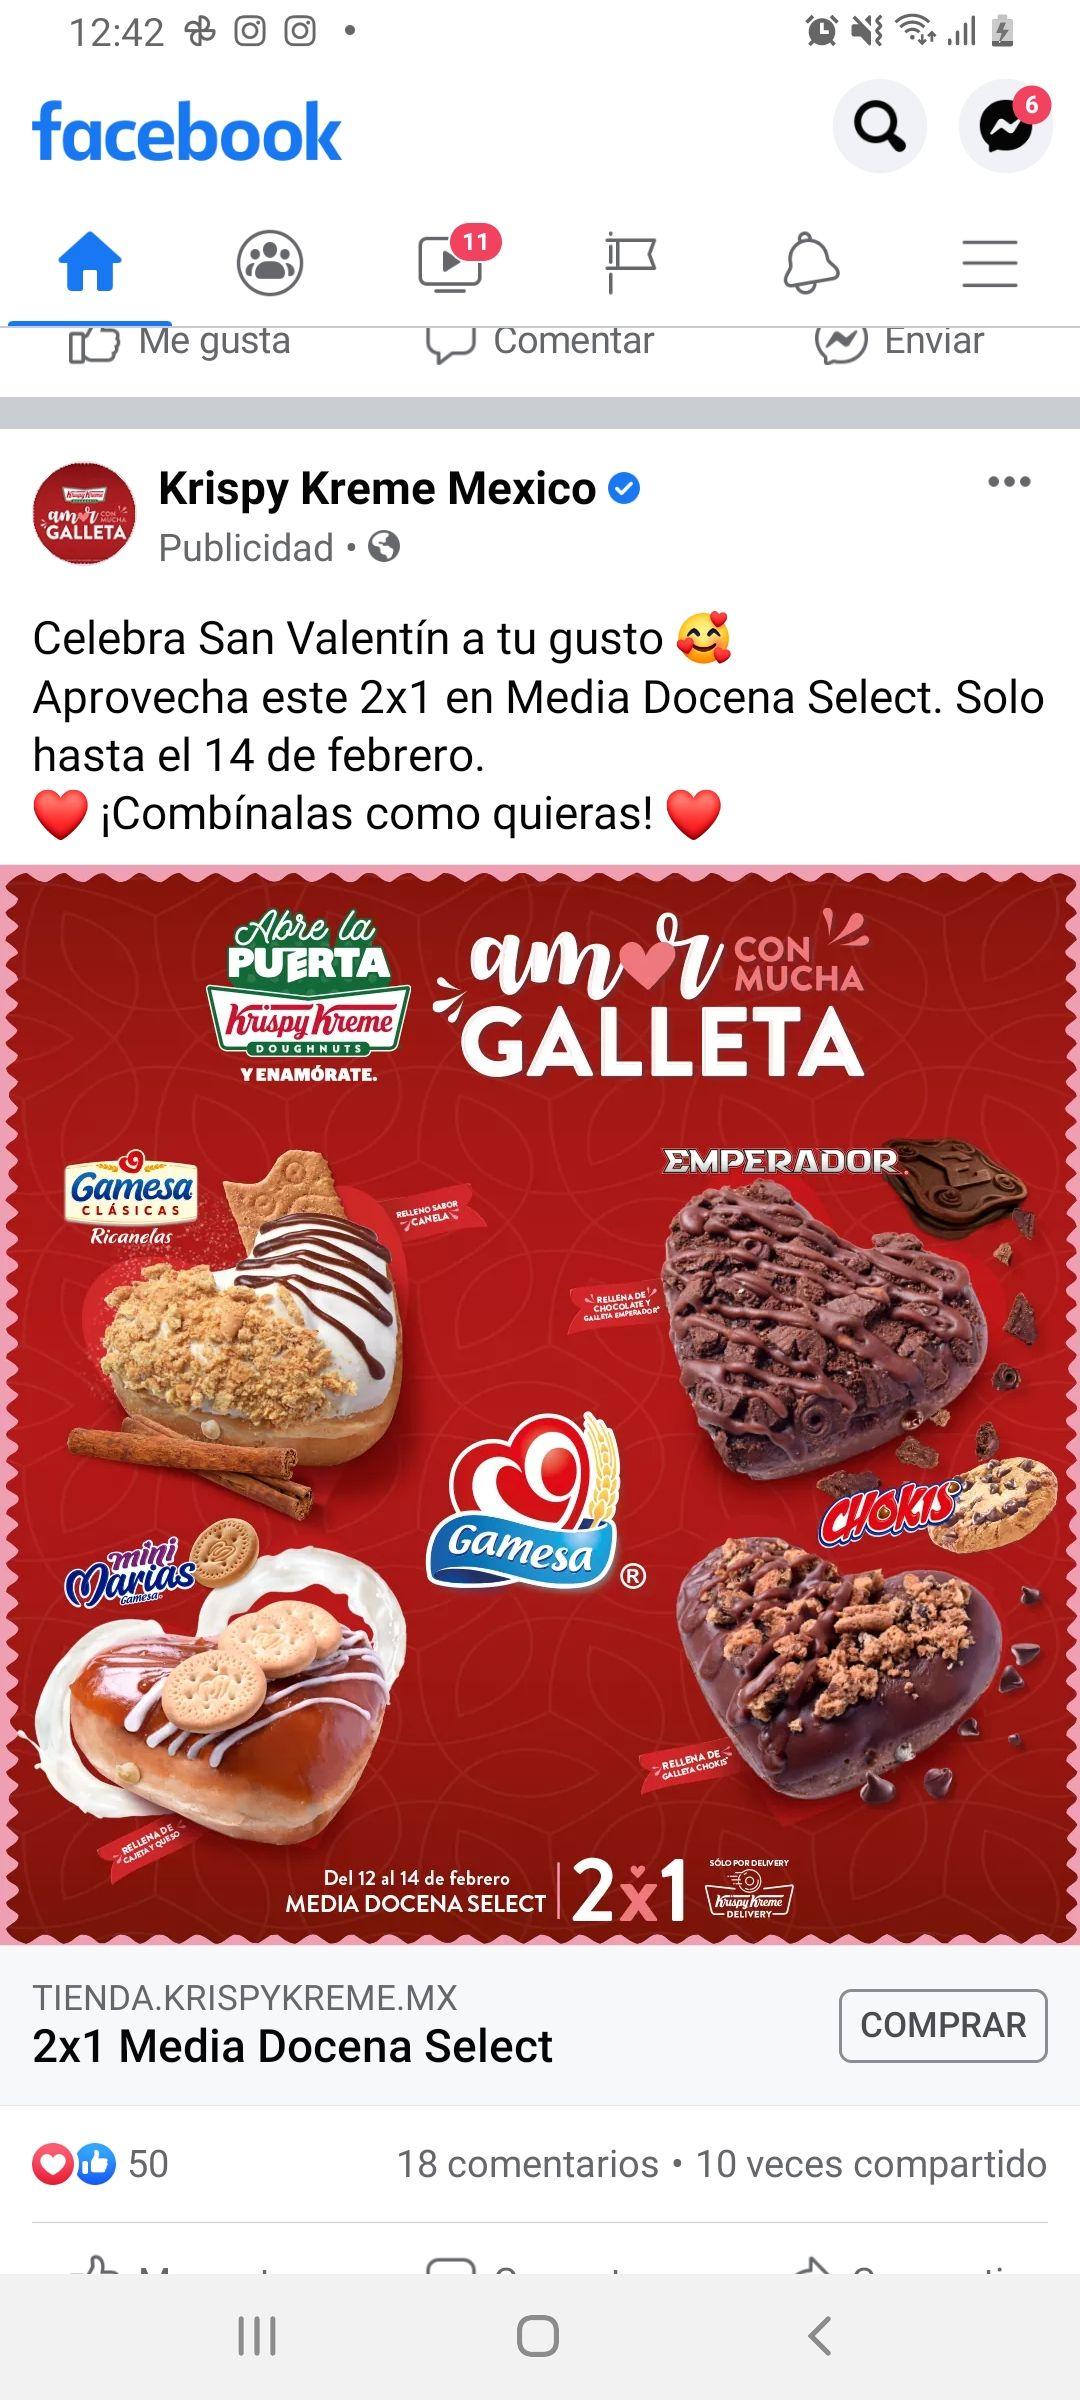 Krispy Kreme: Media docena Select 2x1 por 14 de febrero.